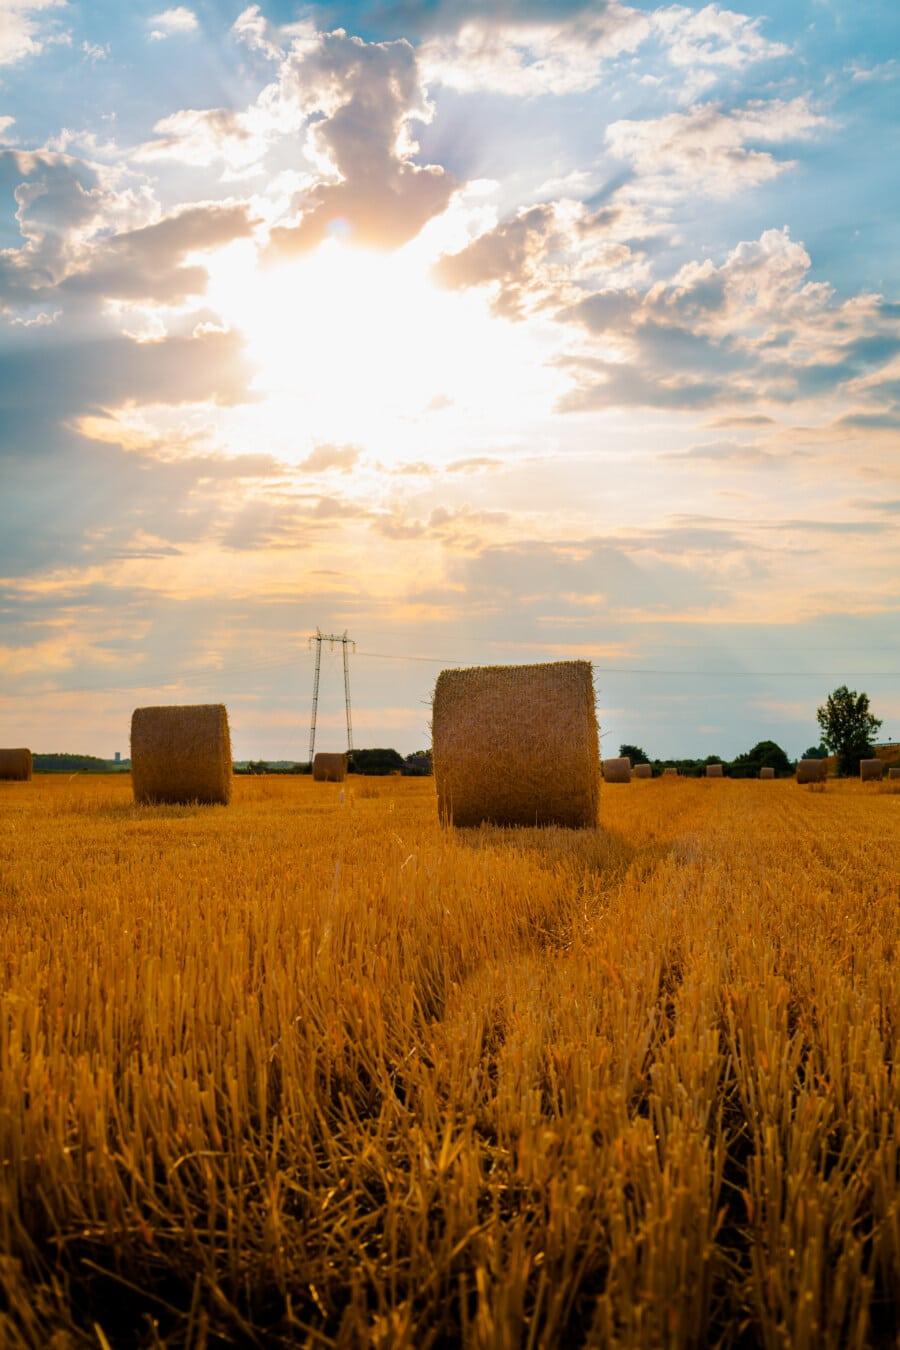 sunlight, sunny, sunshine, haystack, sunrays, hay field, hay, agriculture, field, harvest